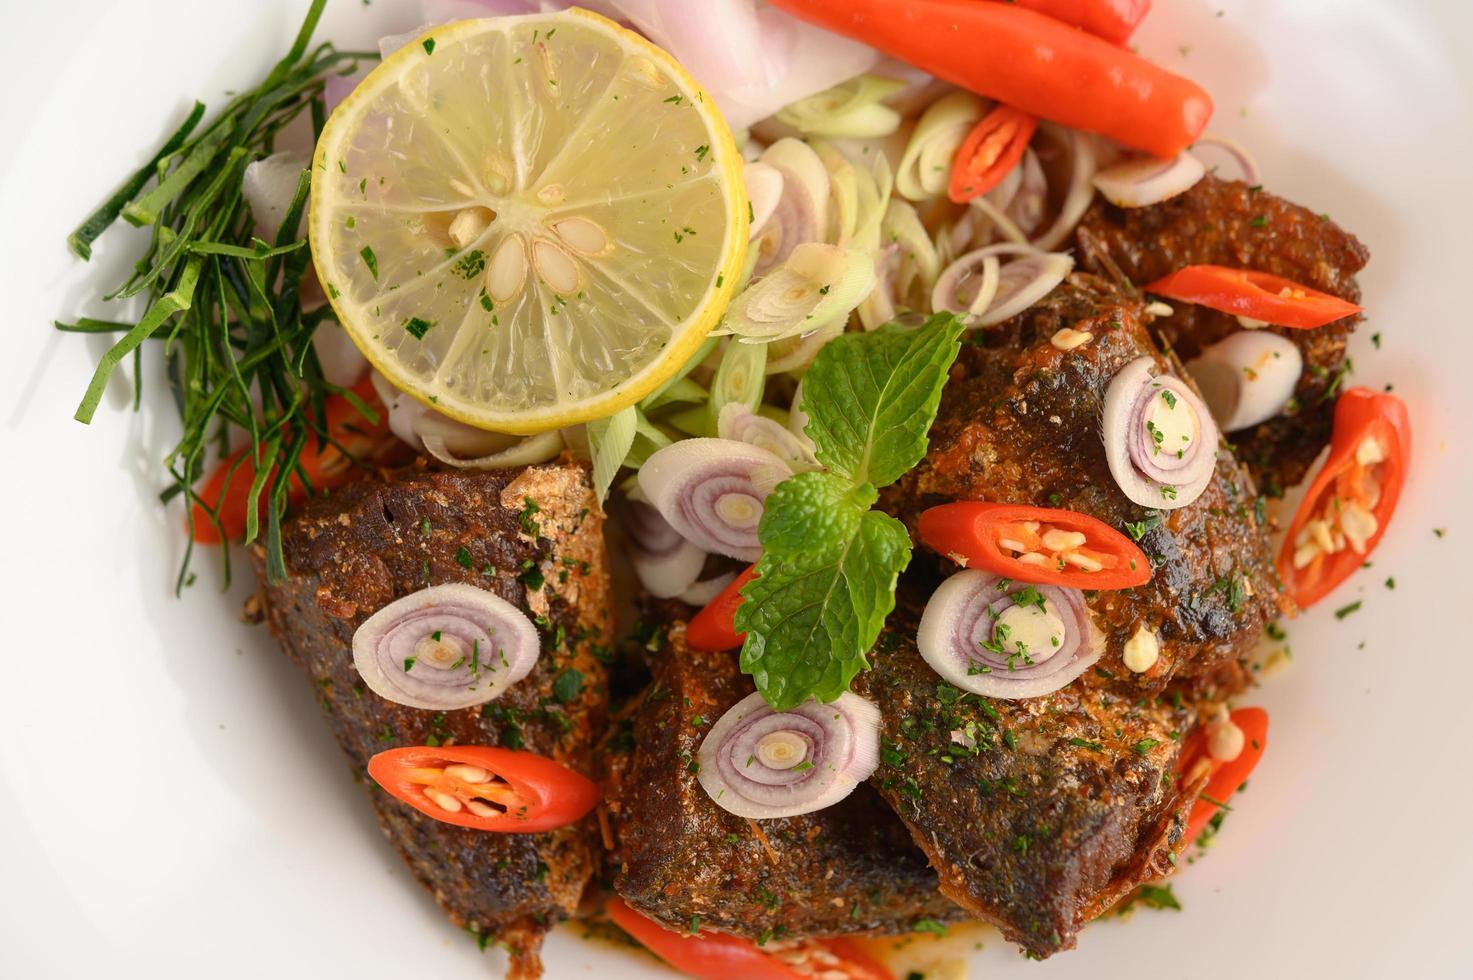 ensalada de sardina picante foto